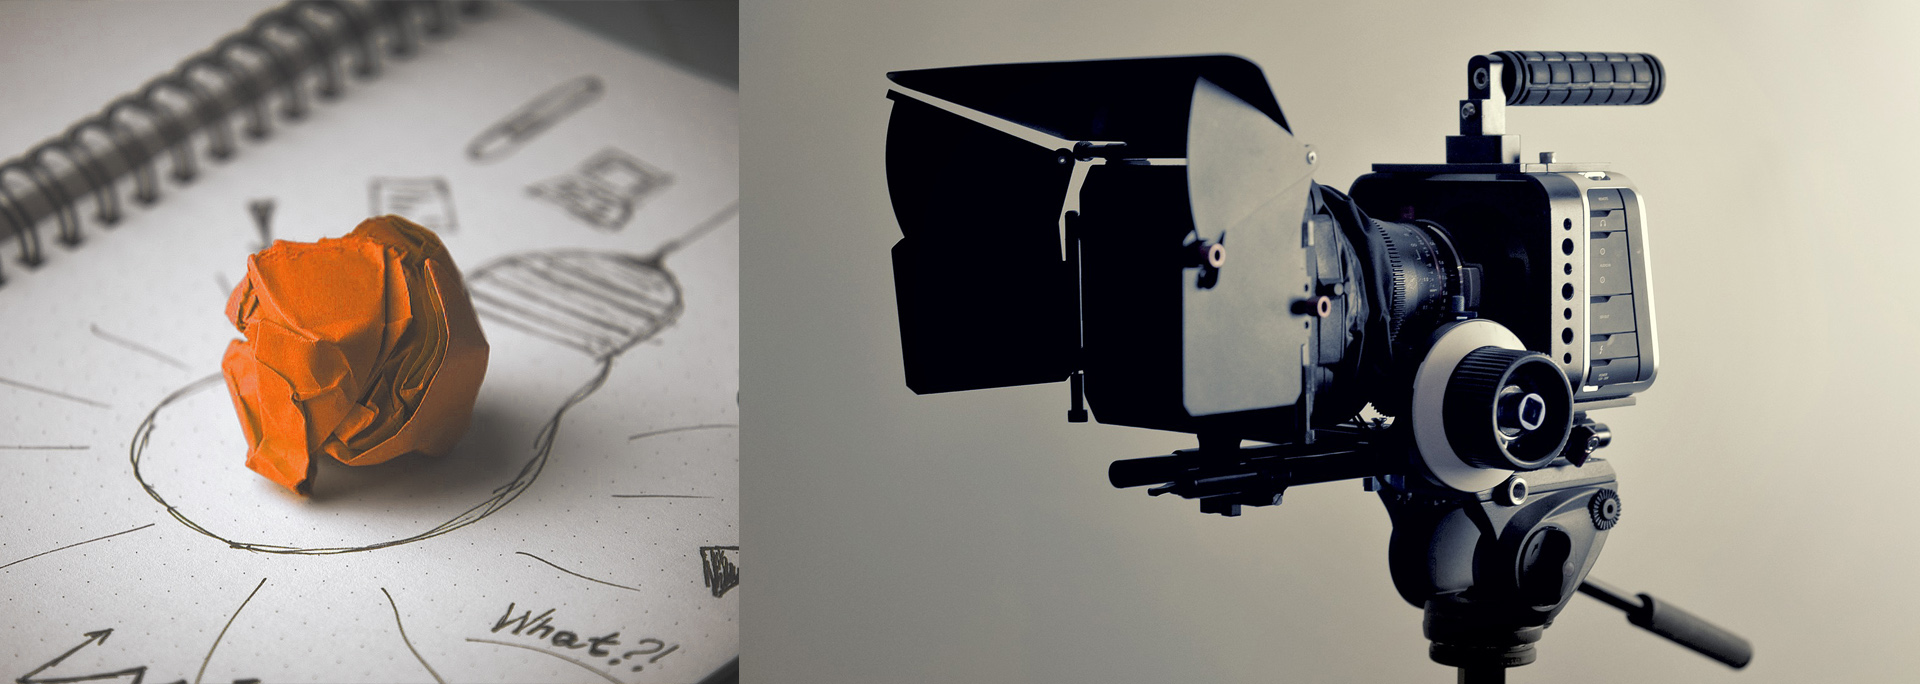 organger-papierkneul-videokamera